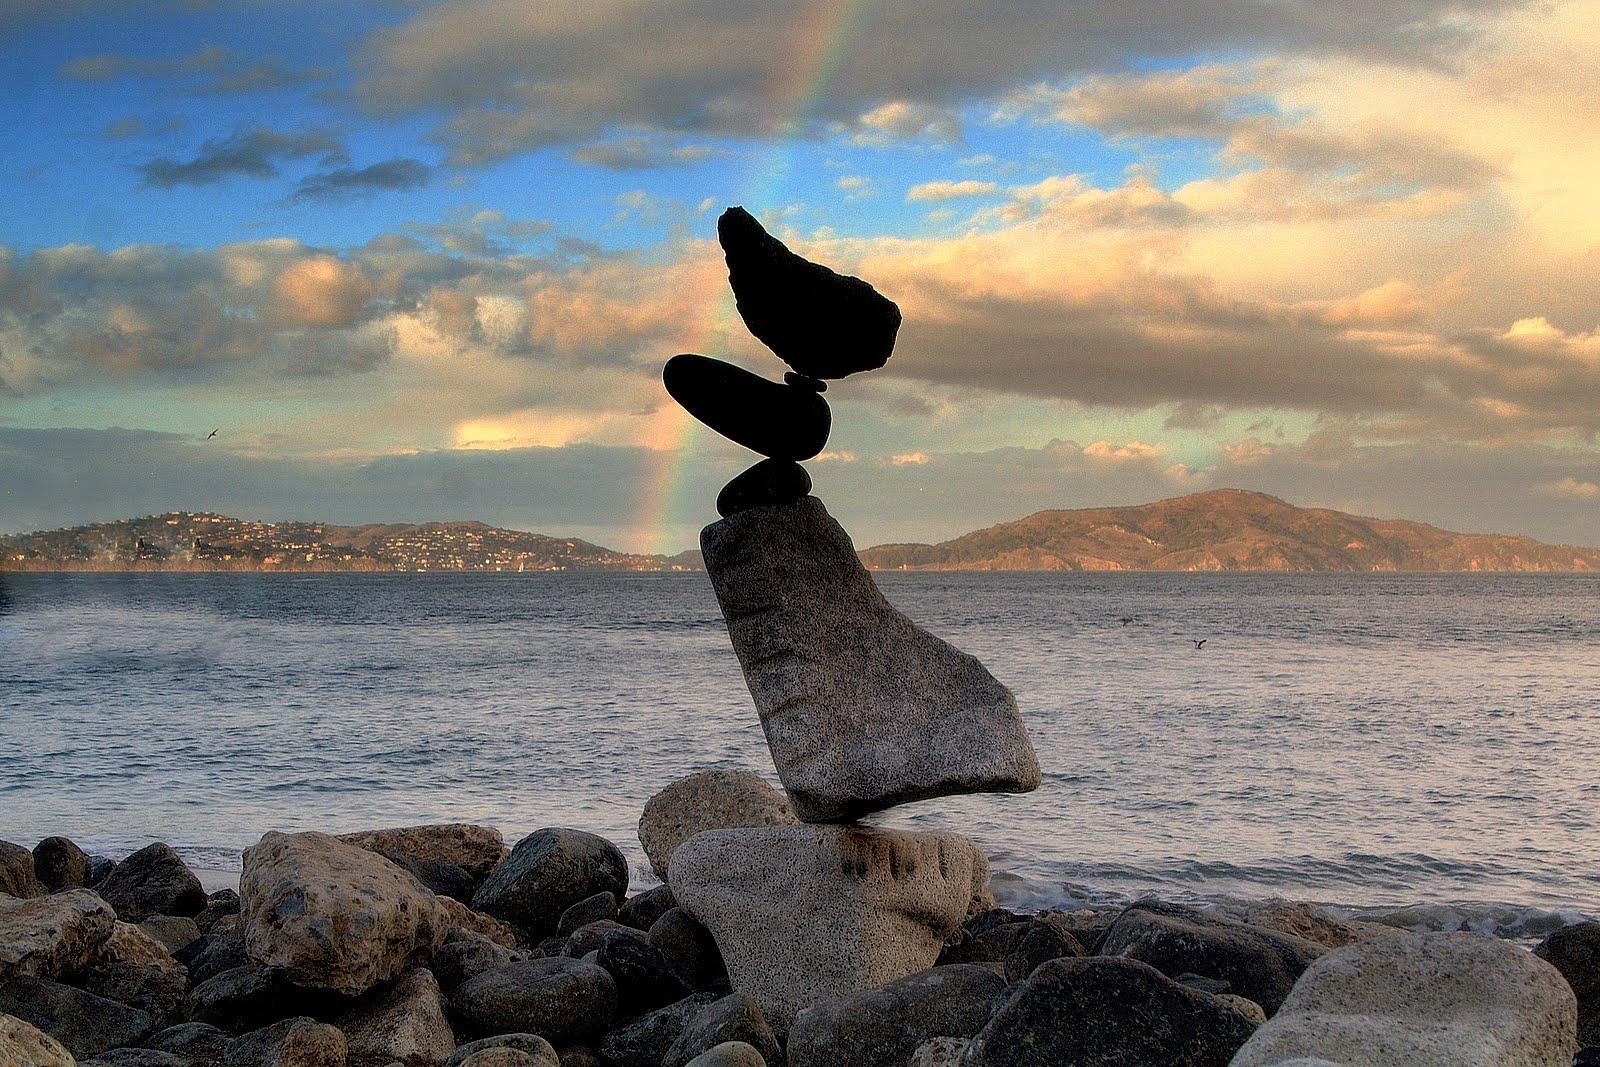 Balance, Centered, Flow